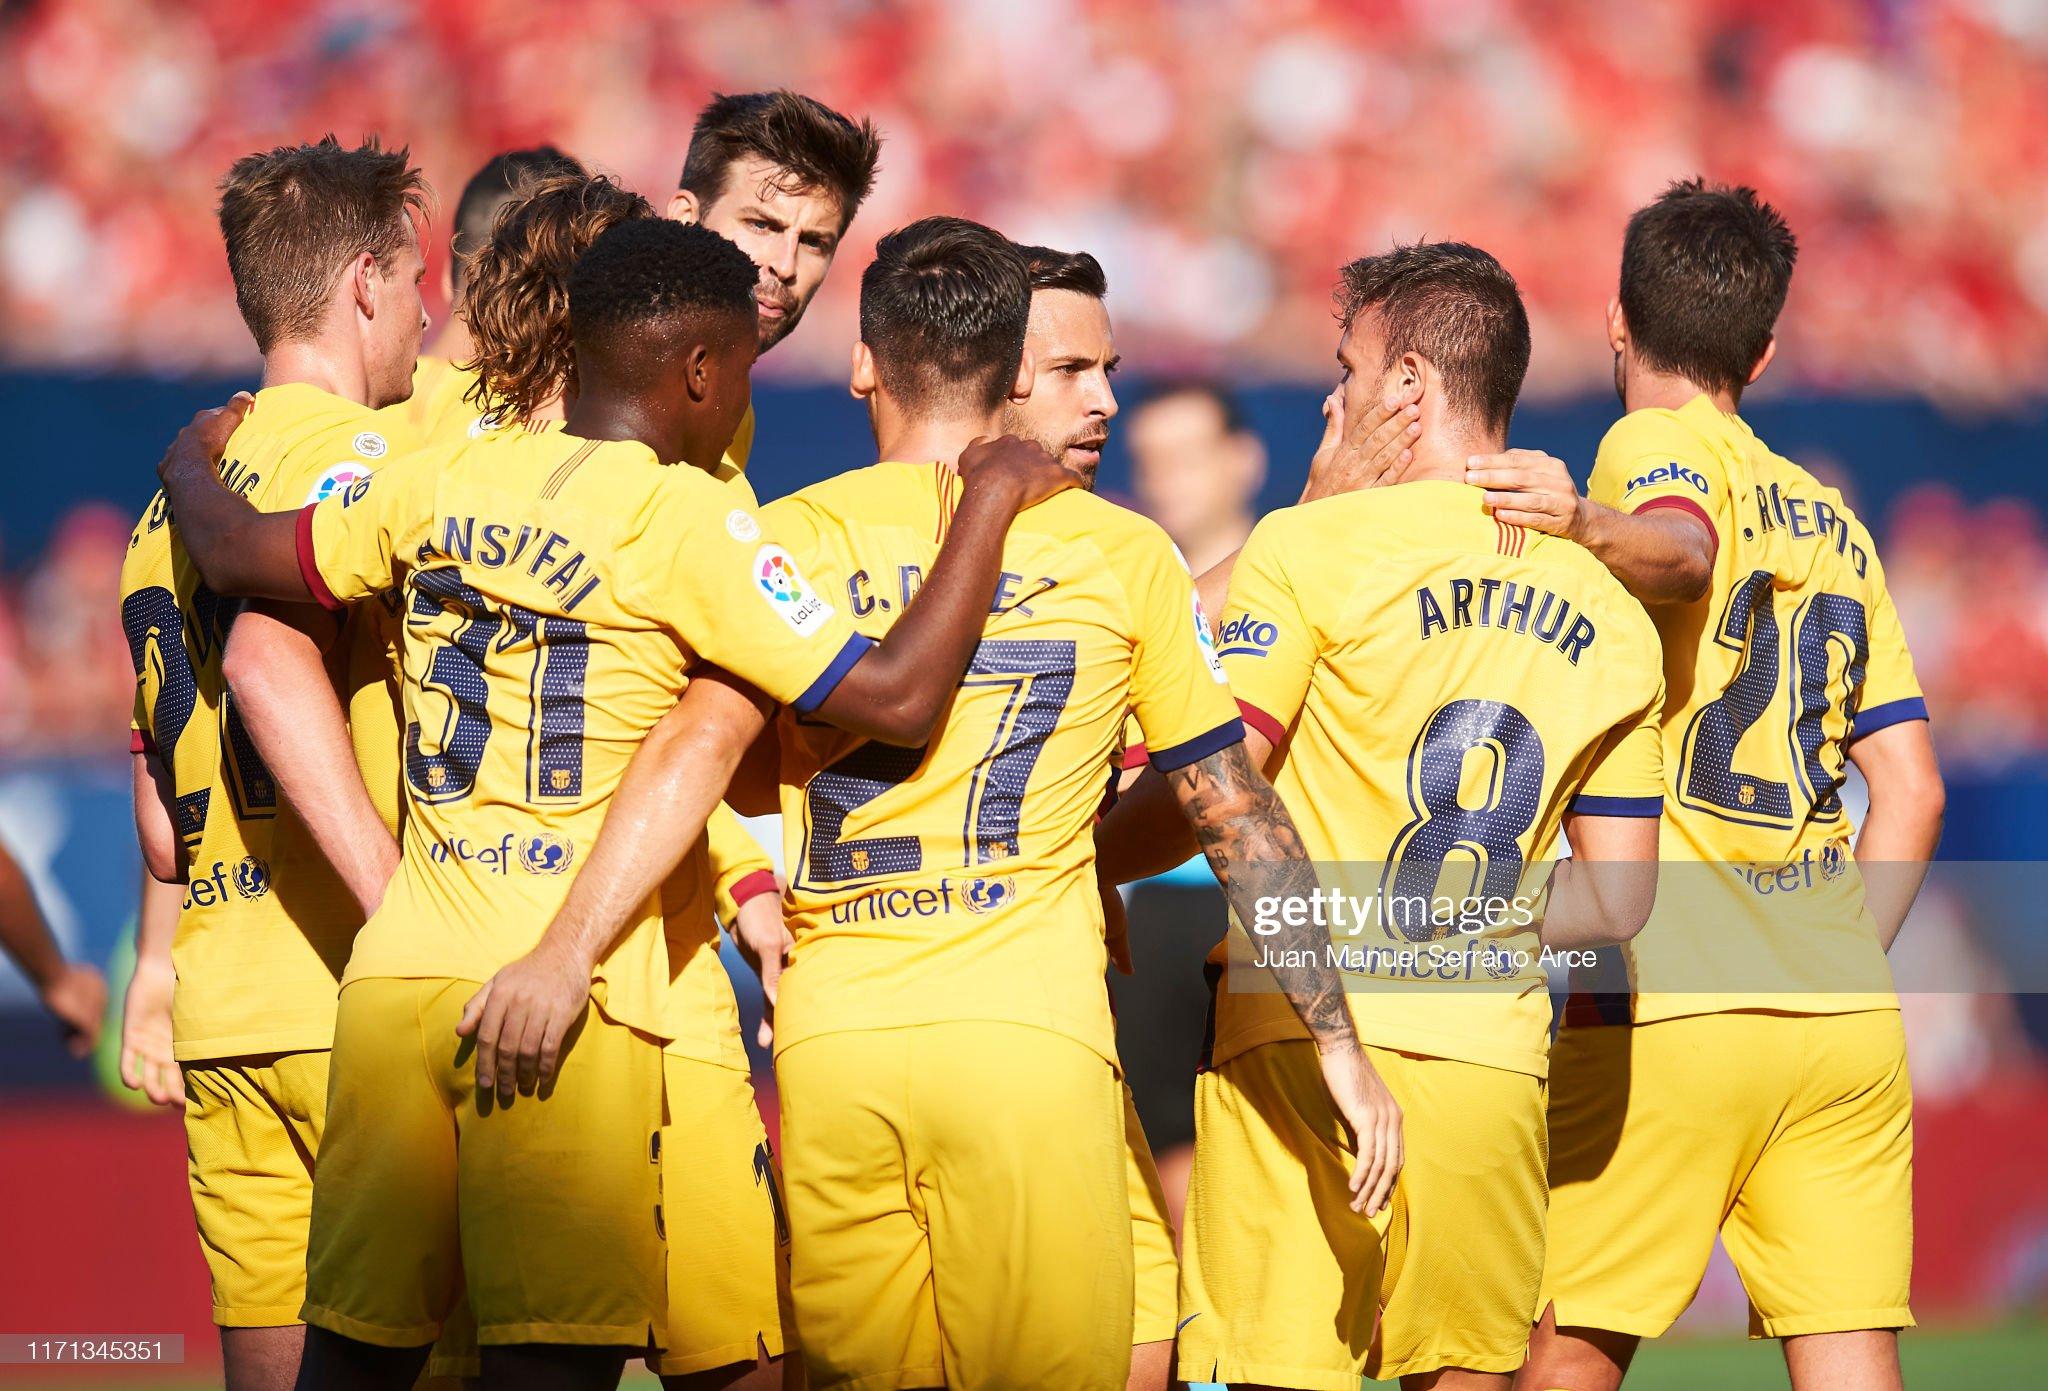 صور مباراة : أوساسونا - برشلونة 2-2 ( 31-08-2019 )  Arthur-melo-of-fc-barcelona-celebrates-with-teammates-after-scoring-picture-id1171345351?s=2048x2048